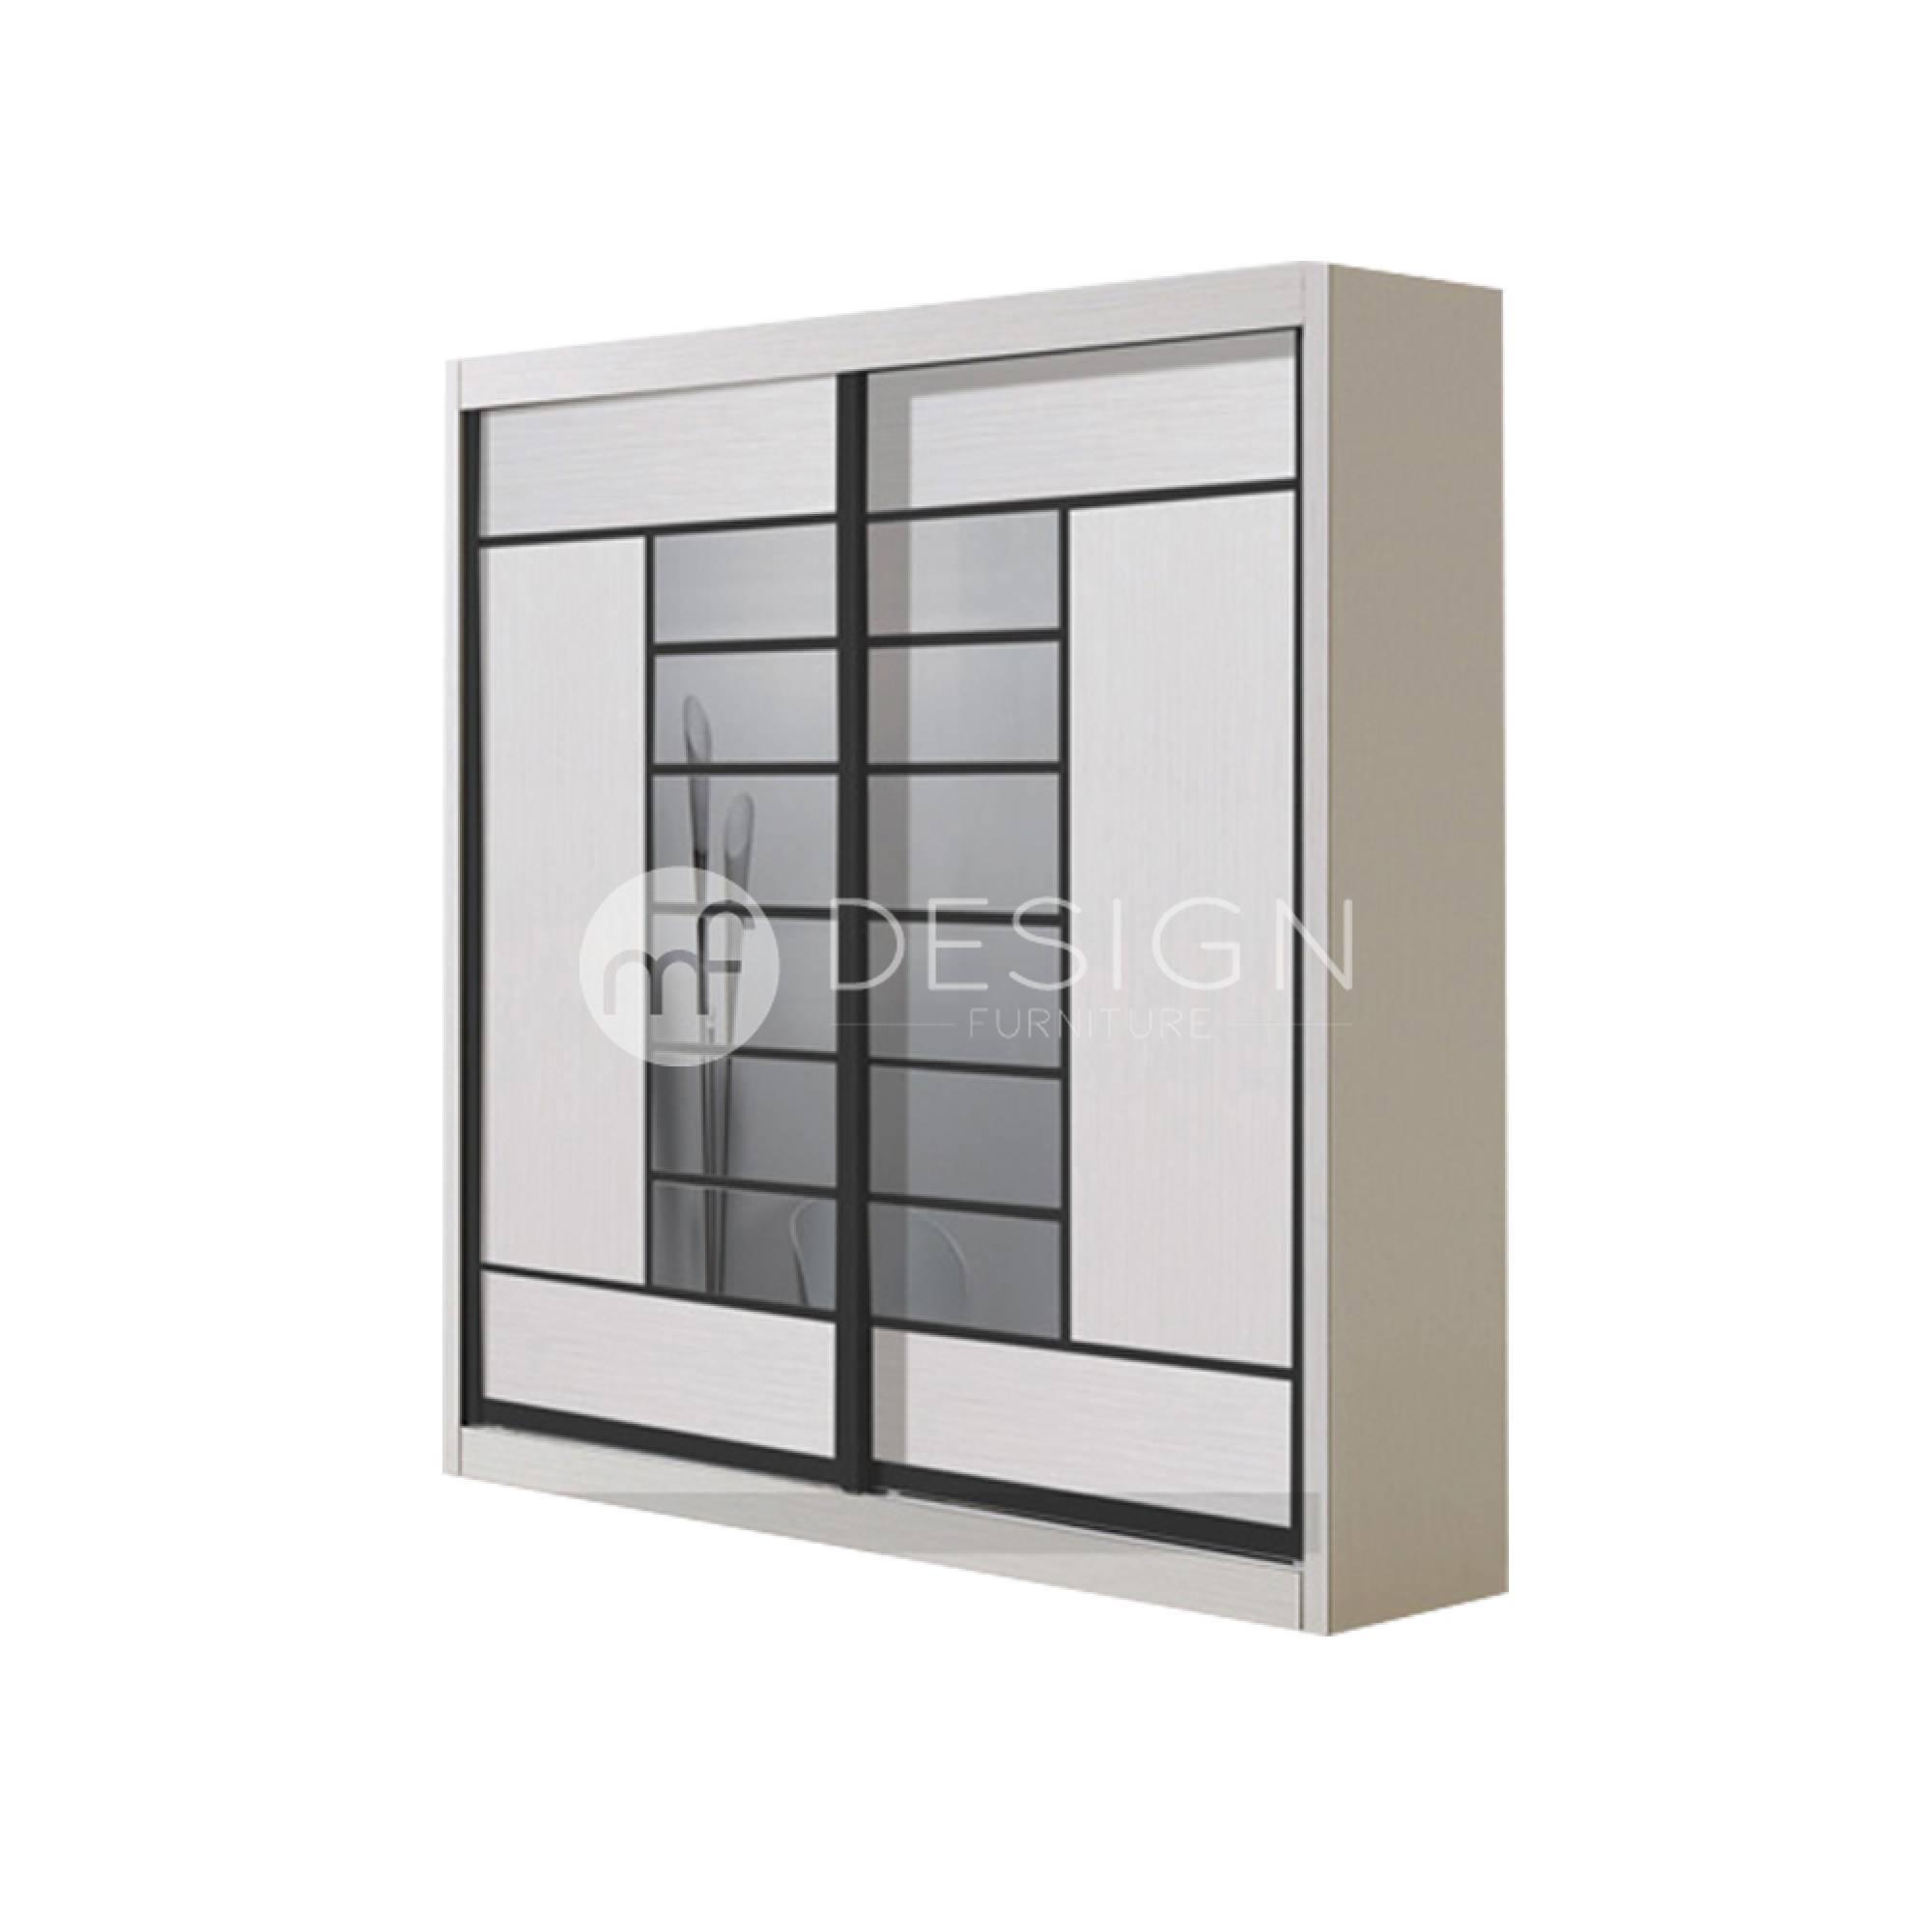 wardrobe 8 feet. mf design silvia 6 x 8 feet wardrobe